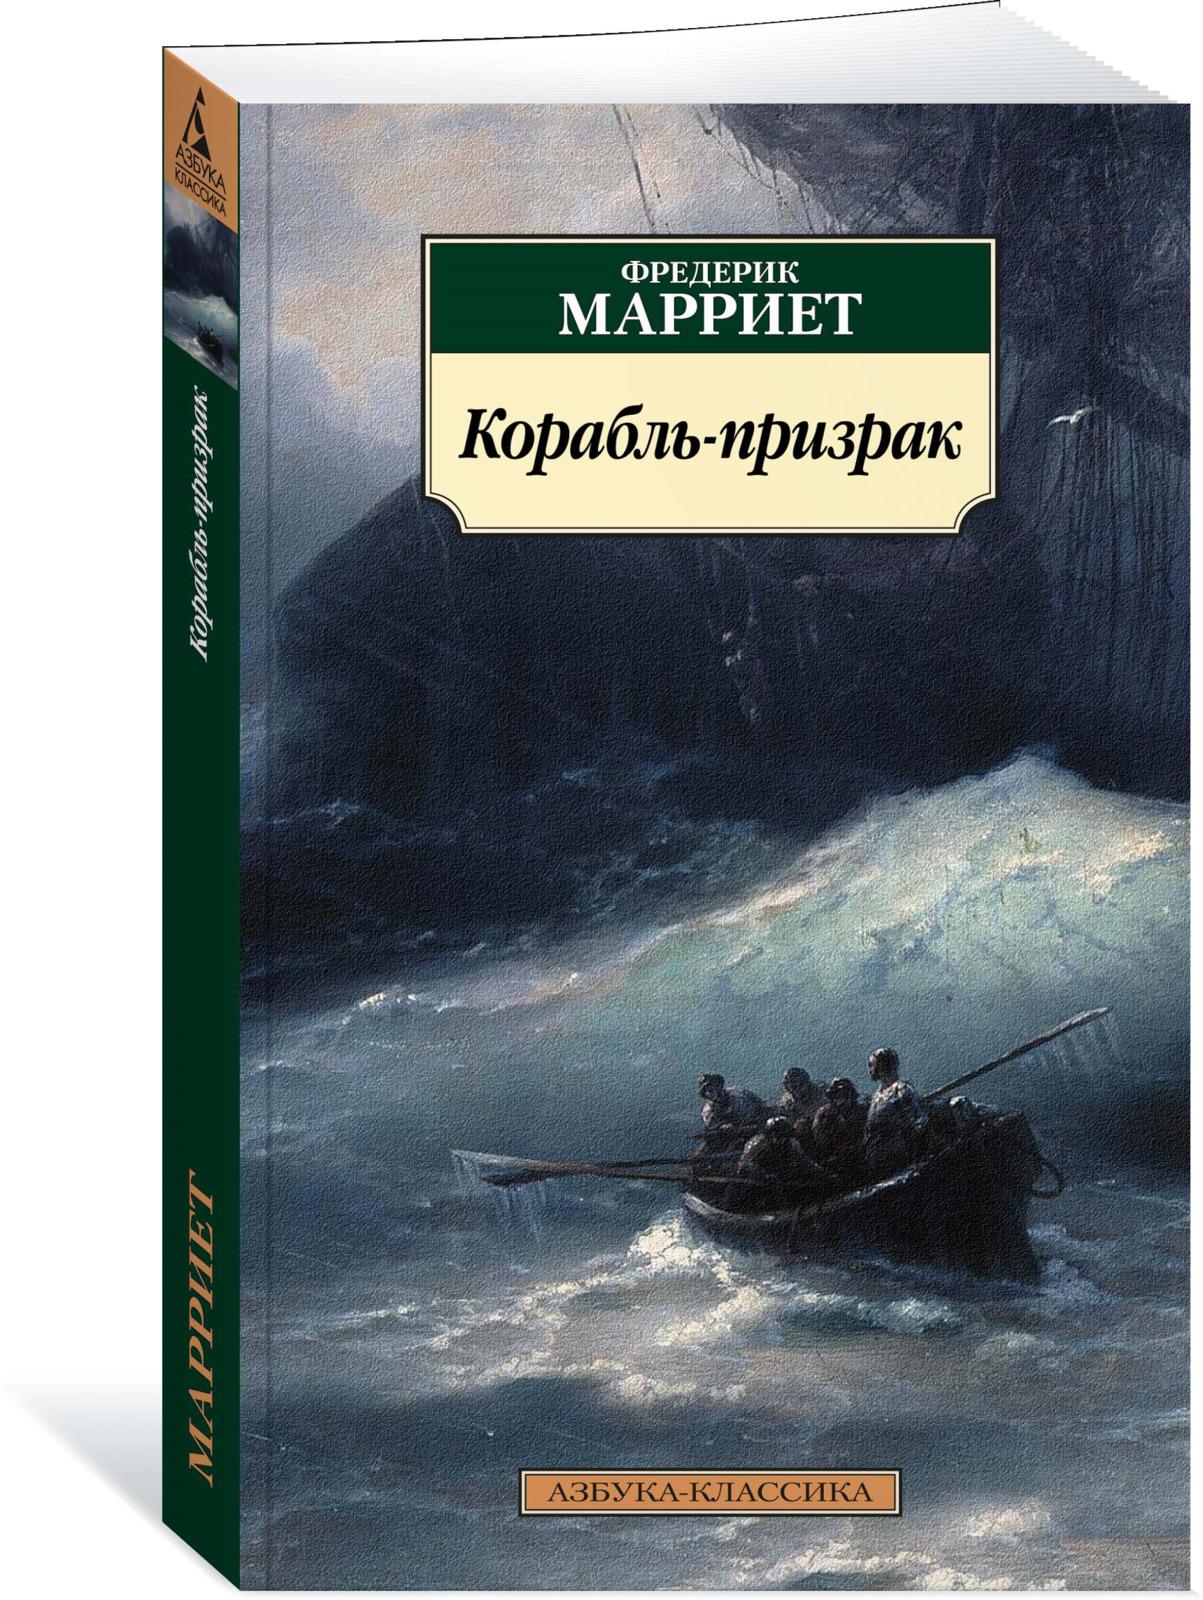 Марриет Фредерик; Королев Кирилл Корабль-призрак марриет ф корабль призрак